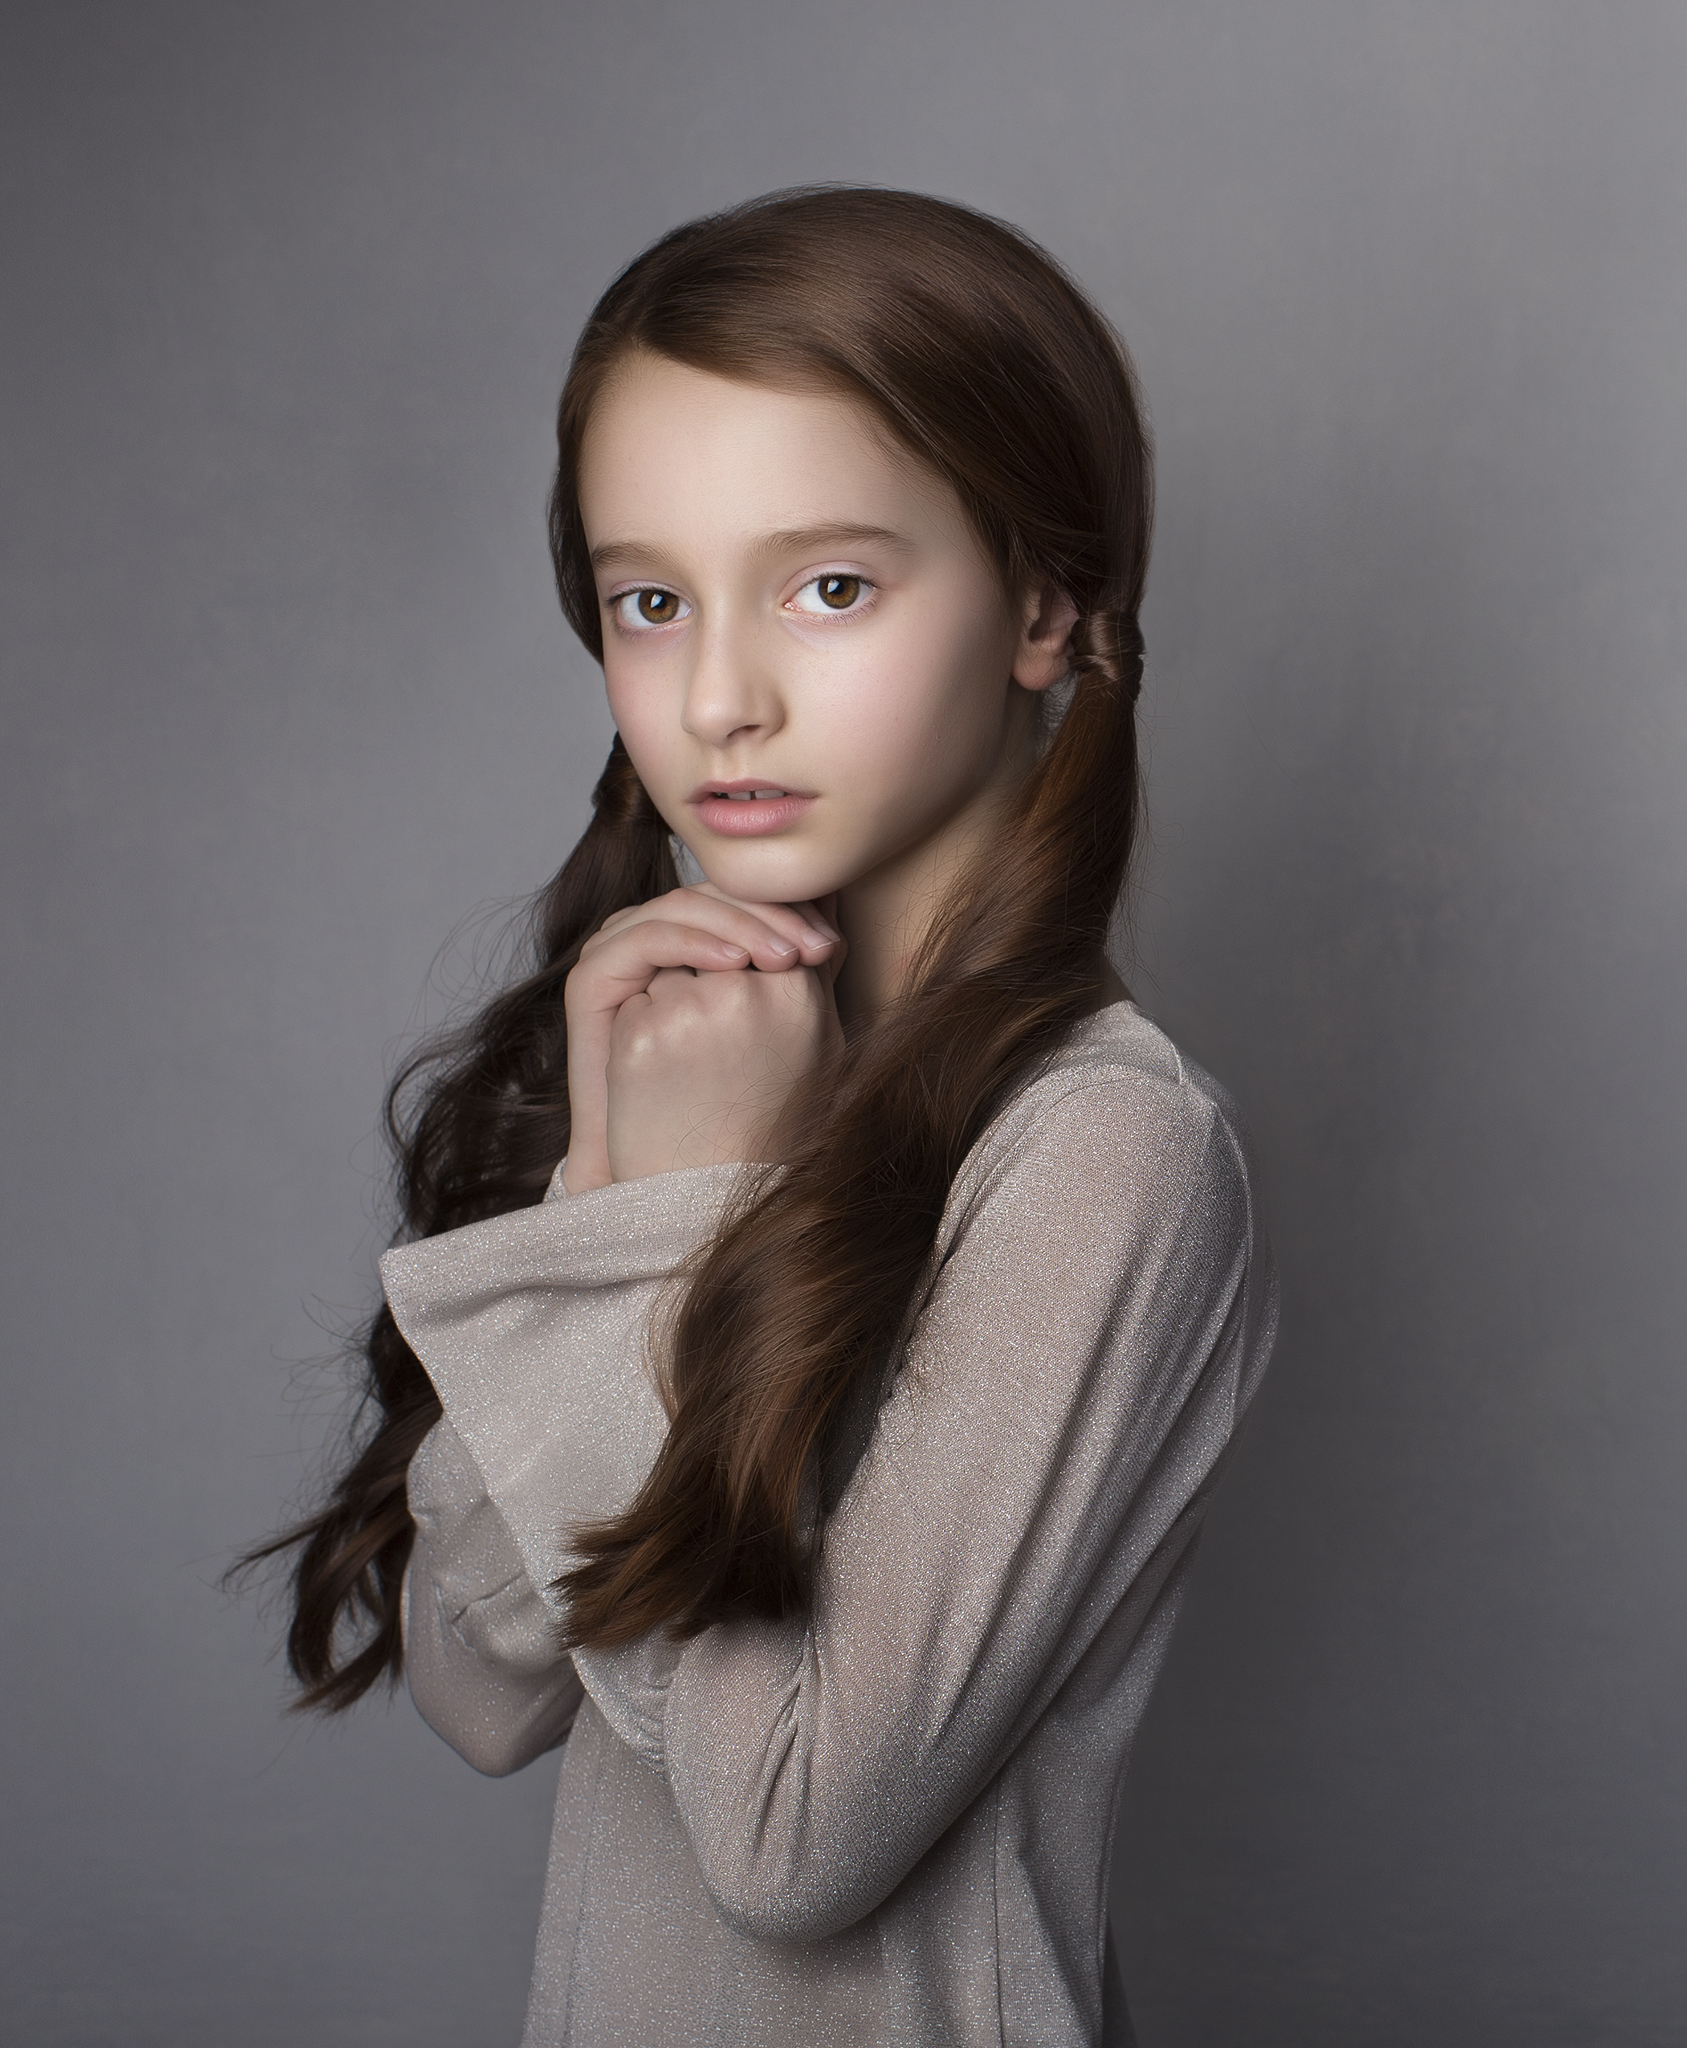 elizabethg_photography_hertfordshire_fineart_child_portrait_model_sadie_byron_bruceandbrown6.jpg